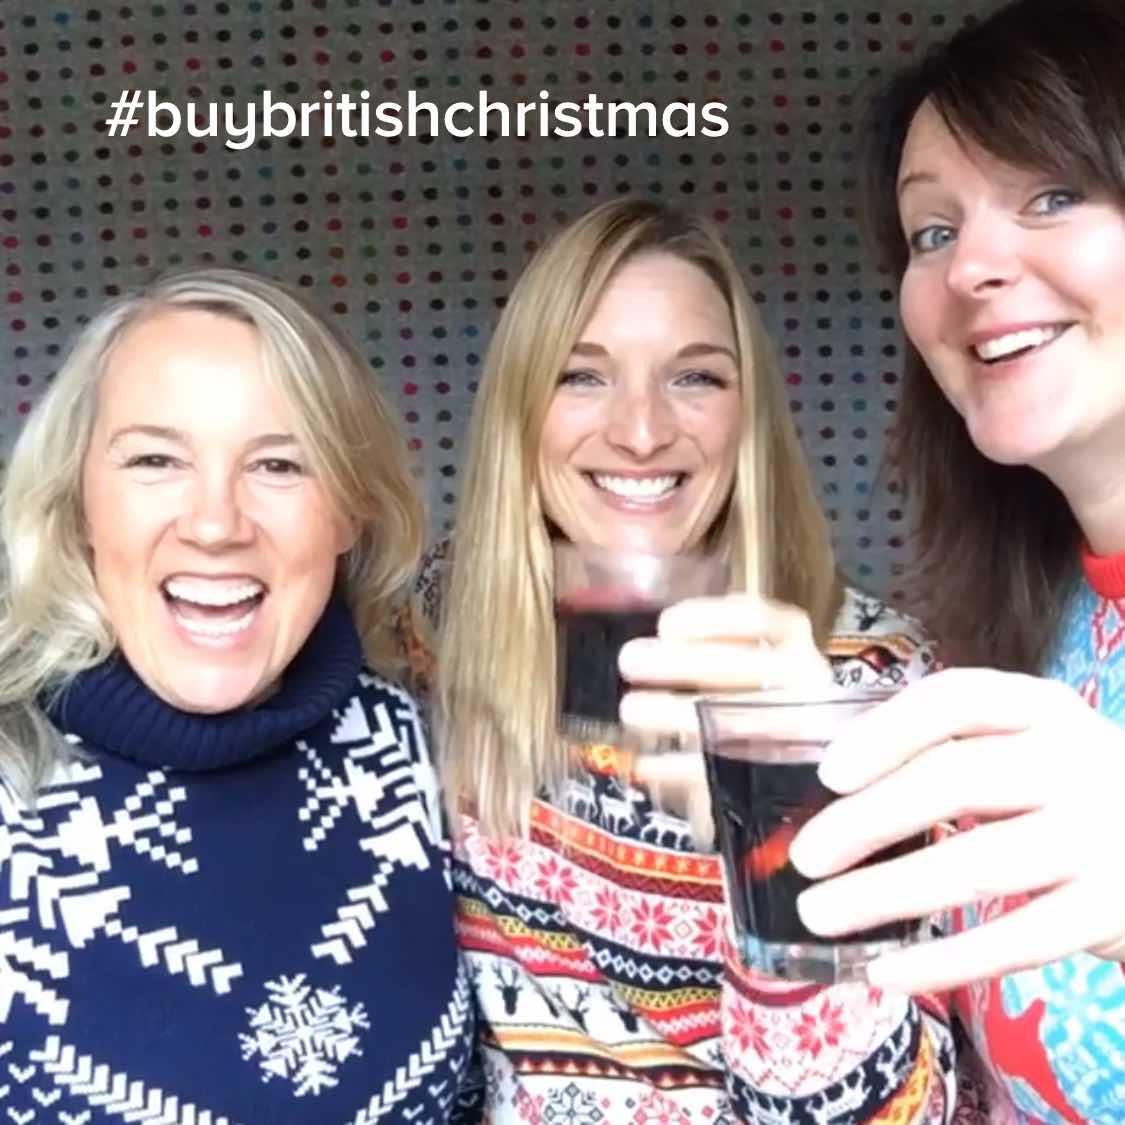 Buy British Christmas campaign